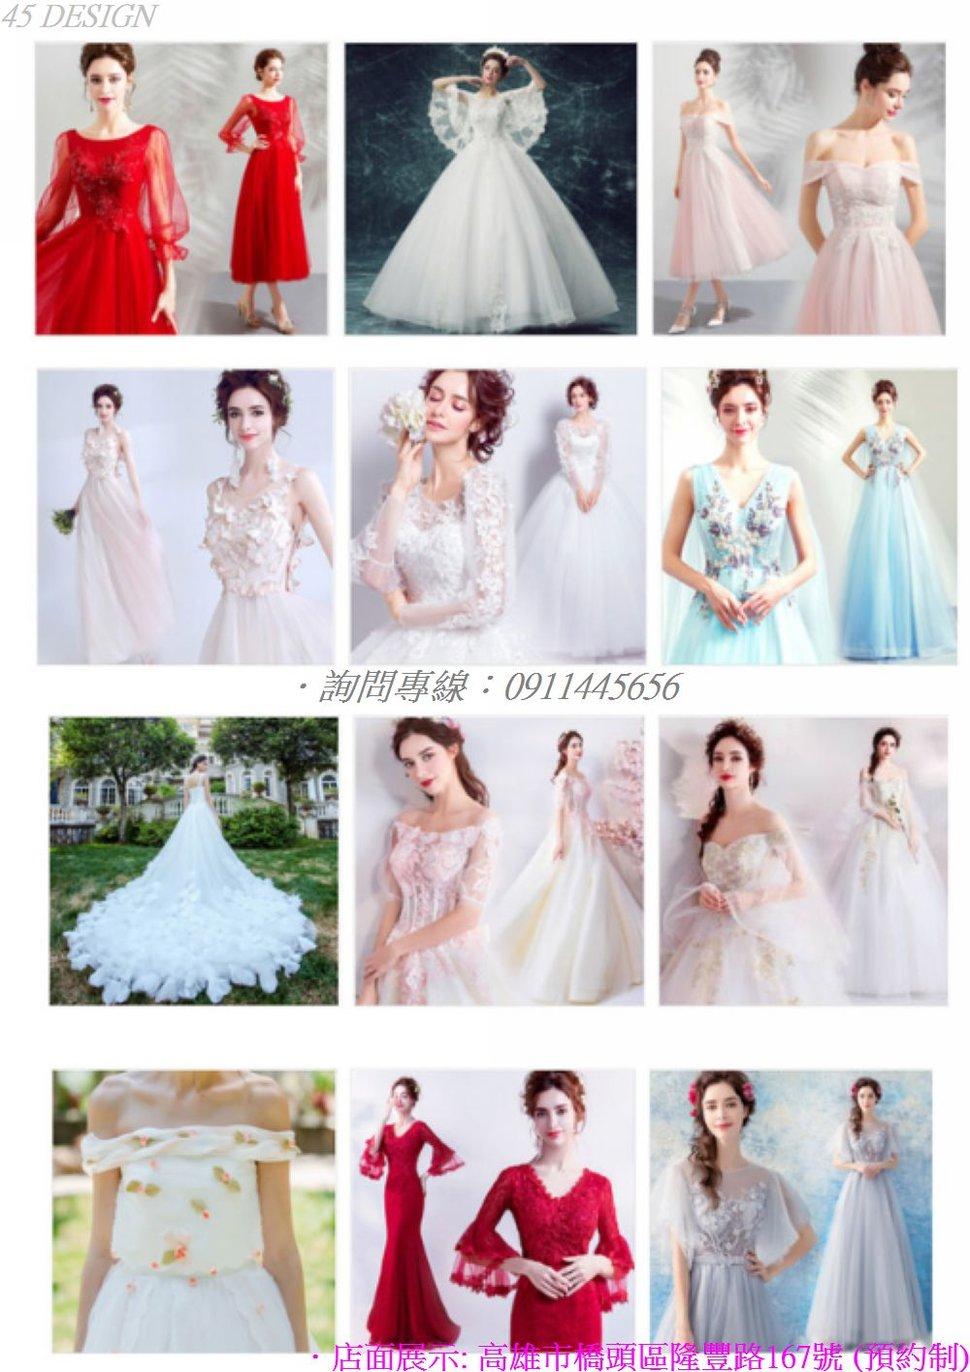 msl190815FF4D88B5178444DD82447ABBB93BD02F - 全台最便宜-45DESIGN四五婚紗禮服《結婚吧》